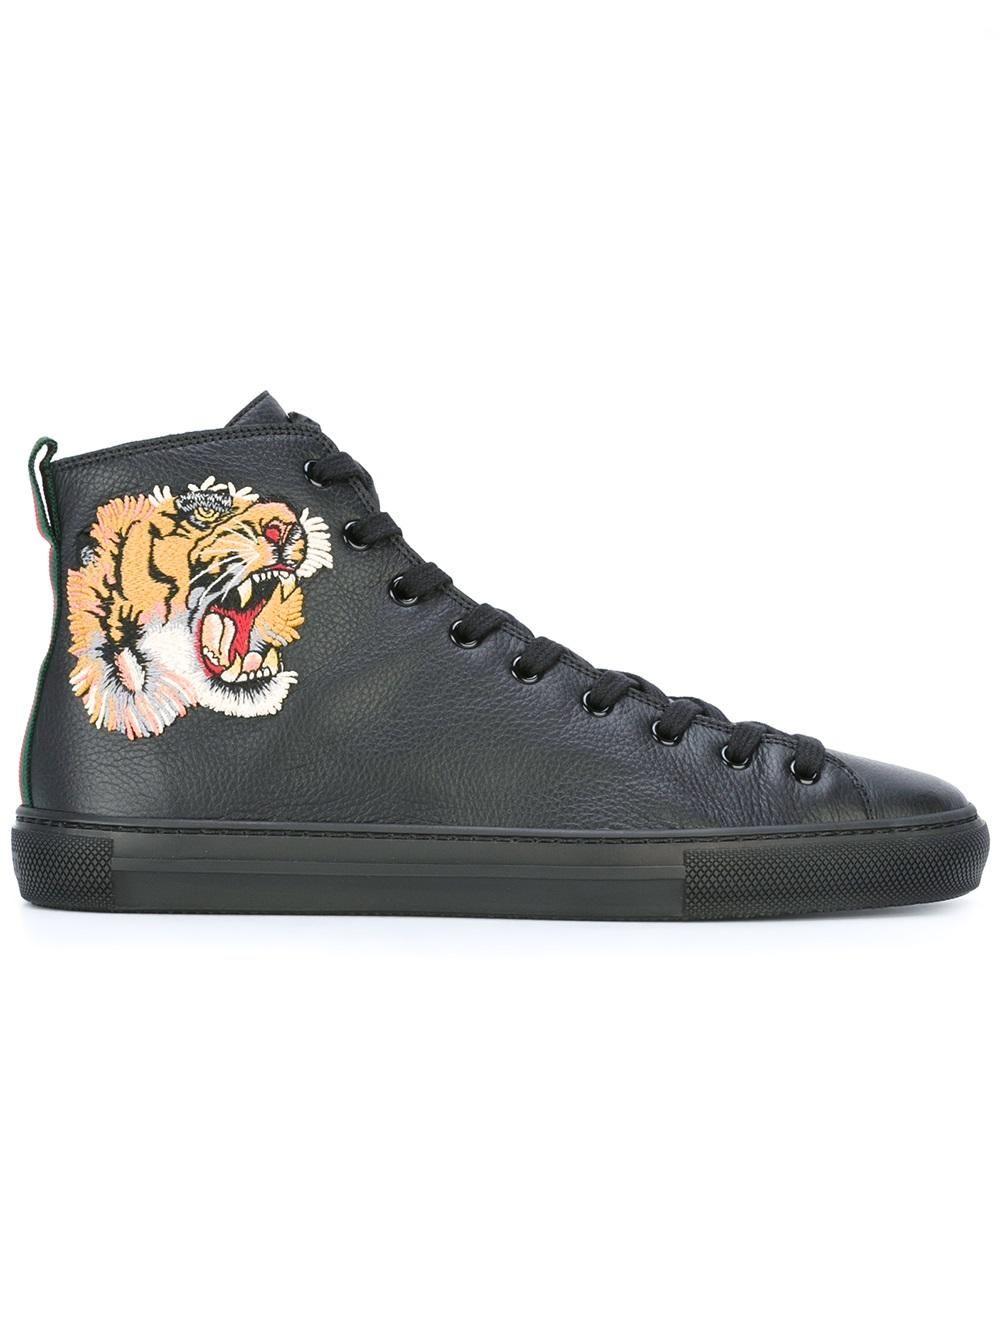 Gucci Zapatillas Altas Con Motivo De Tigre  221e8c6fe40